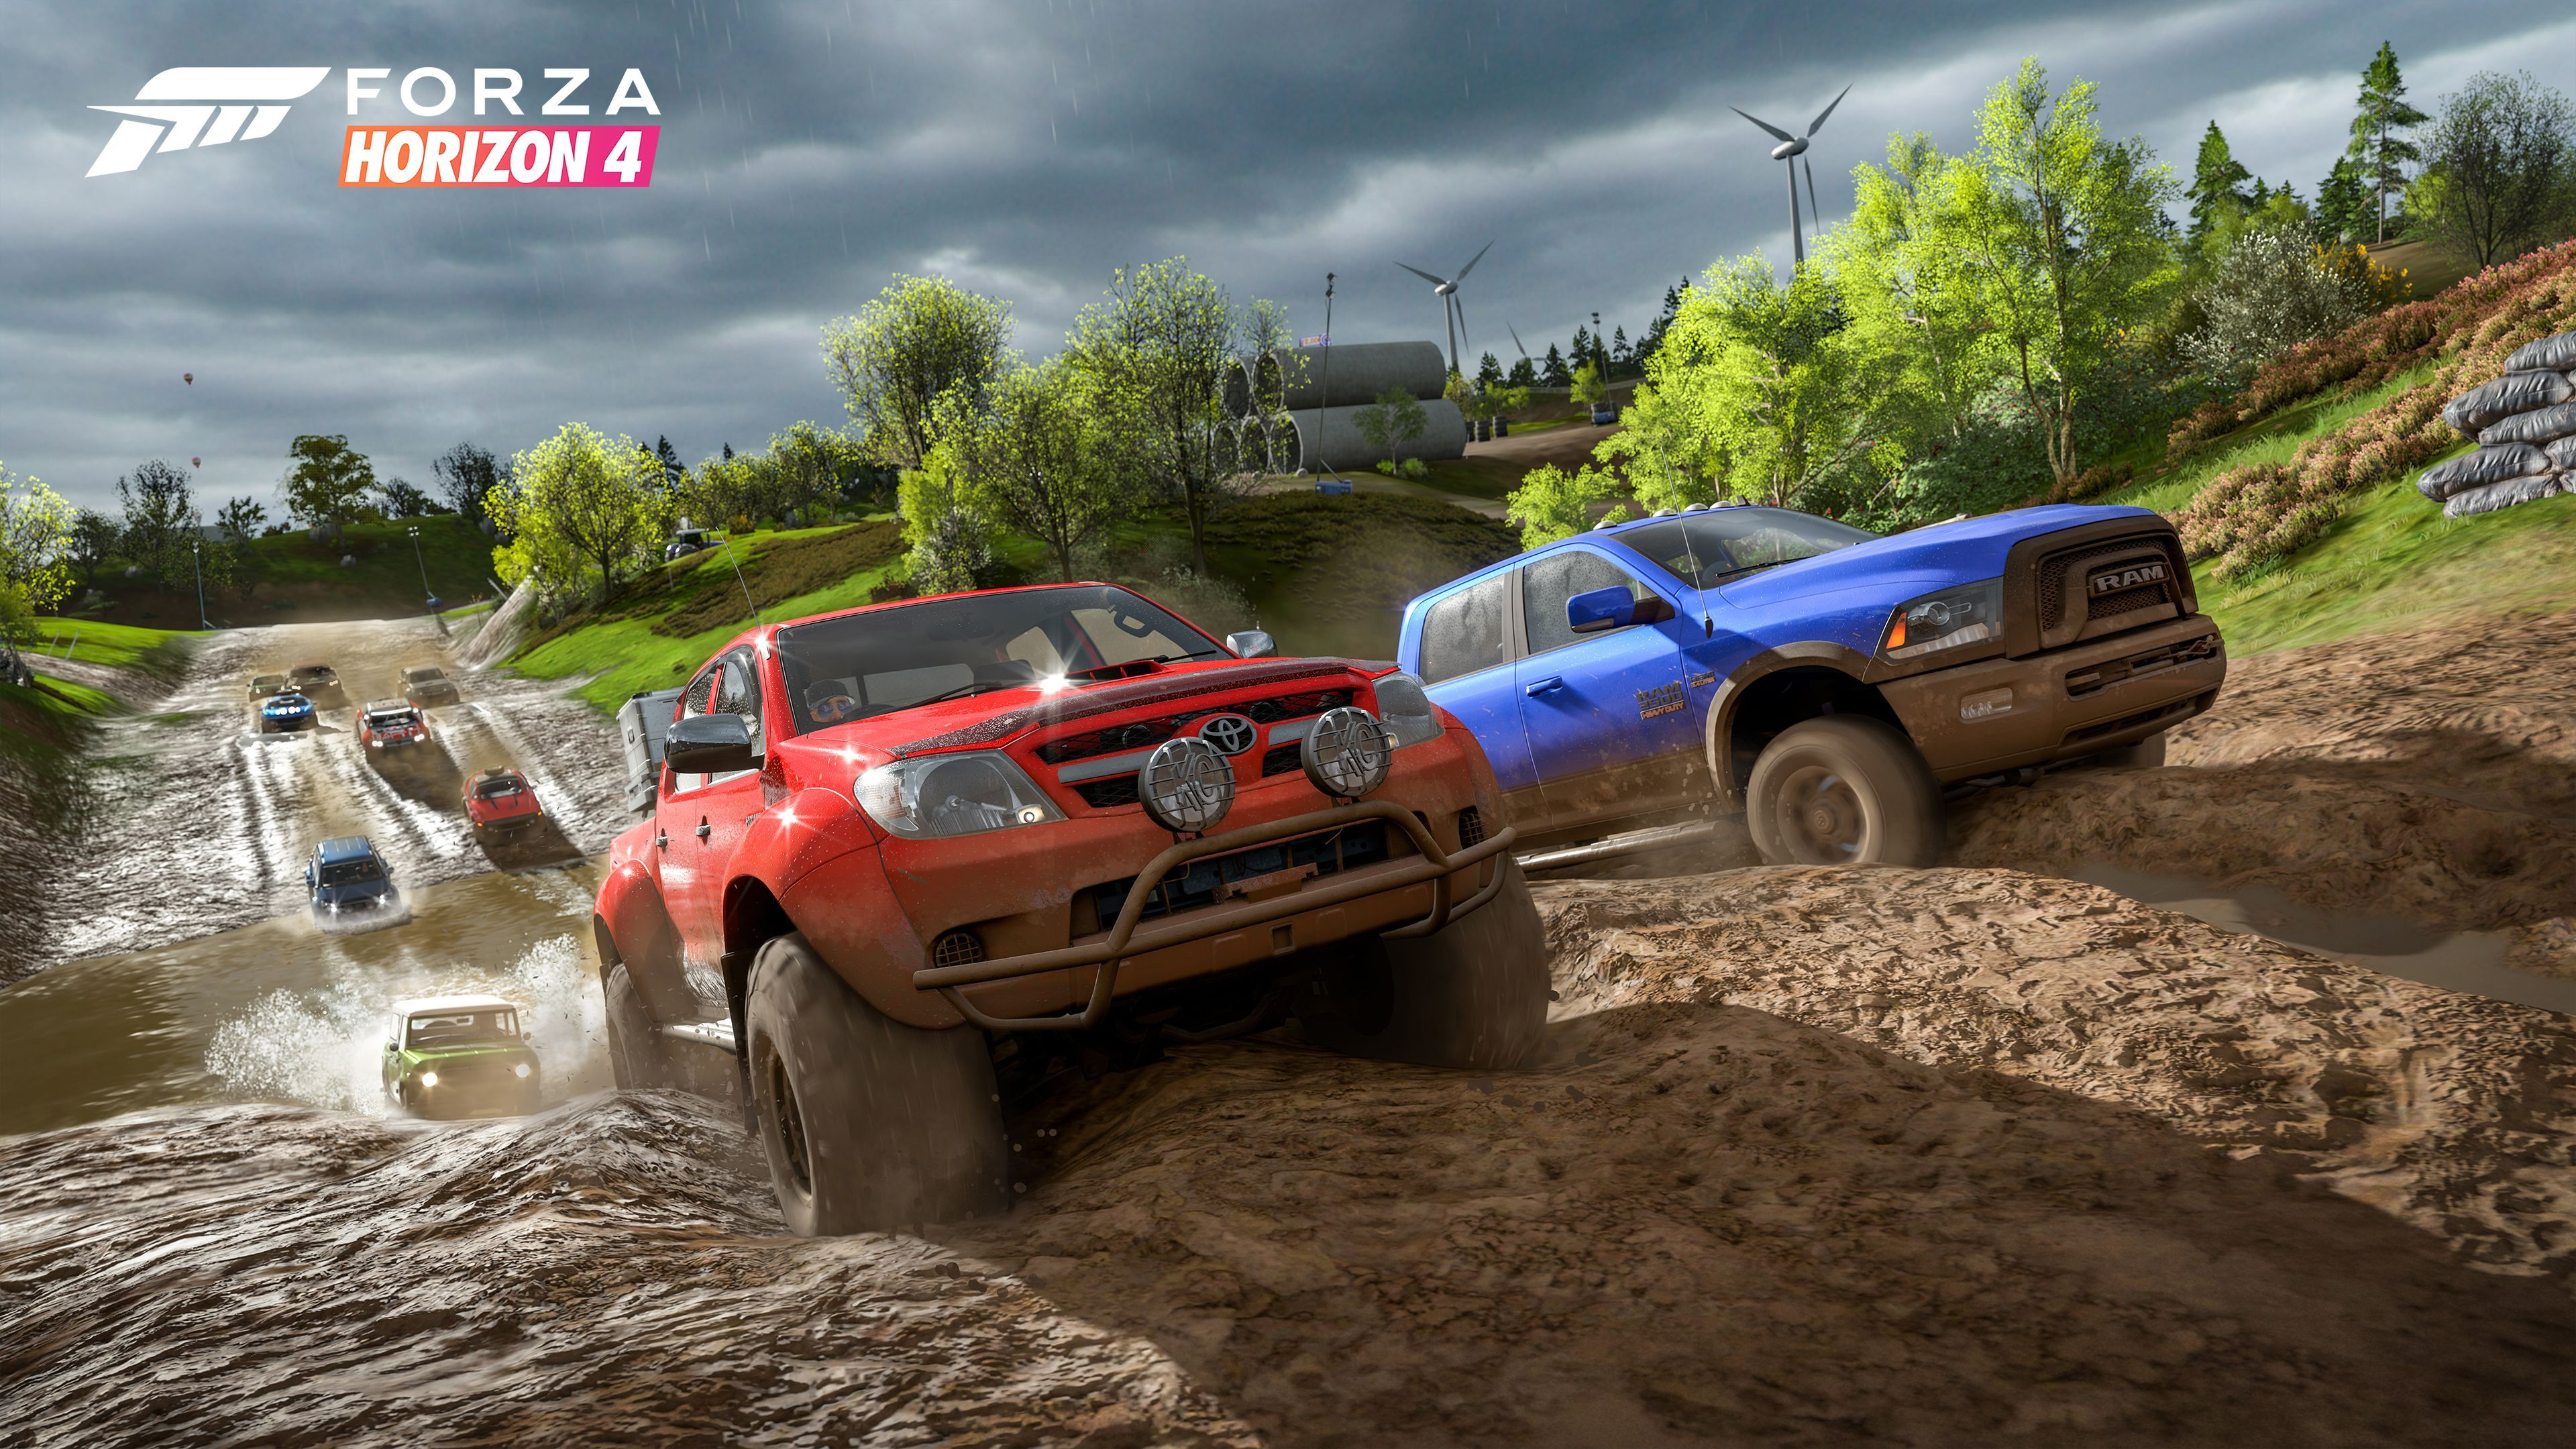 Forza horizon 4 gets first 4k screenshots and details